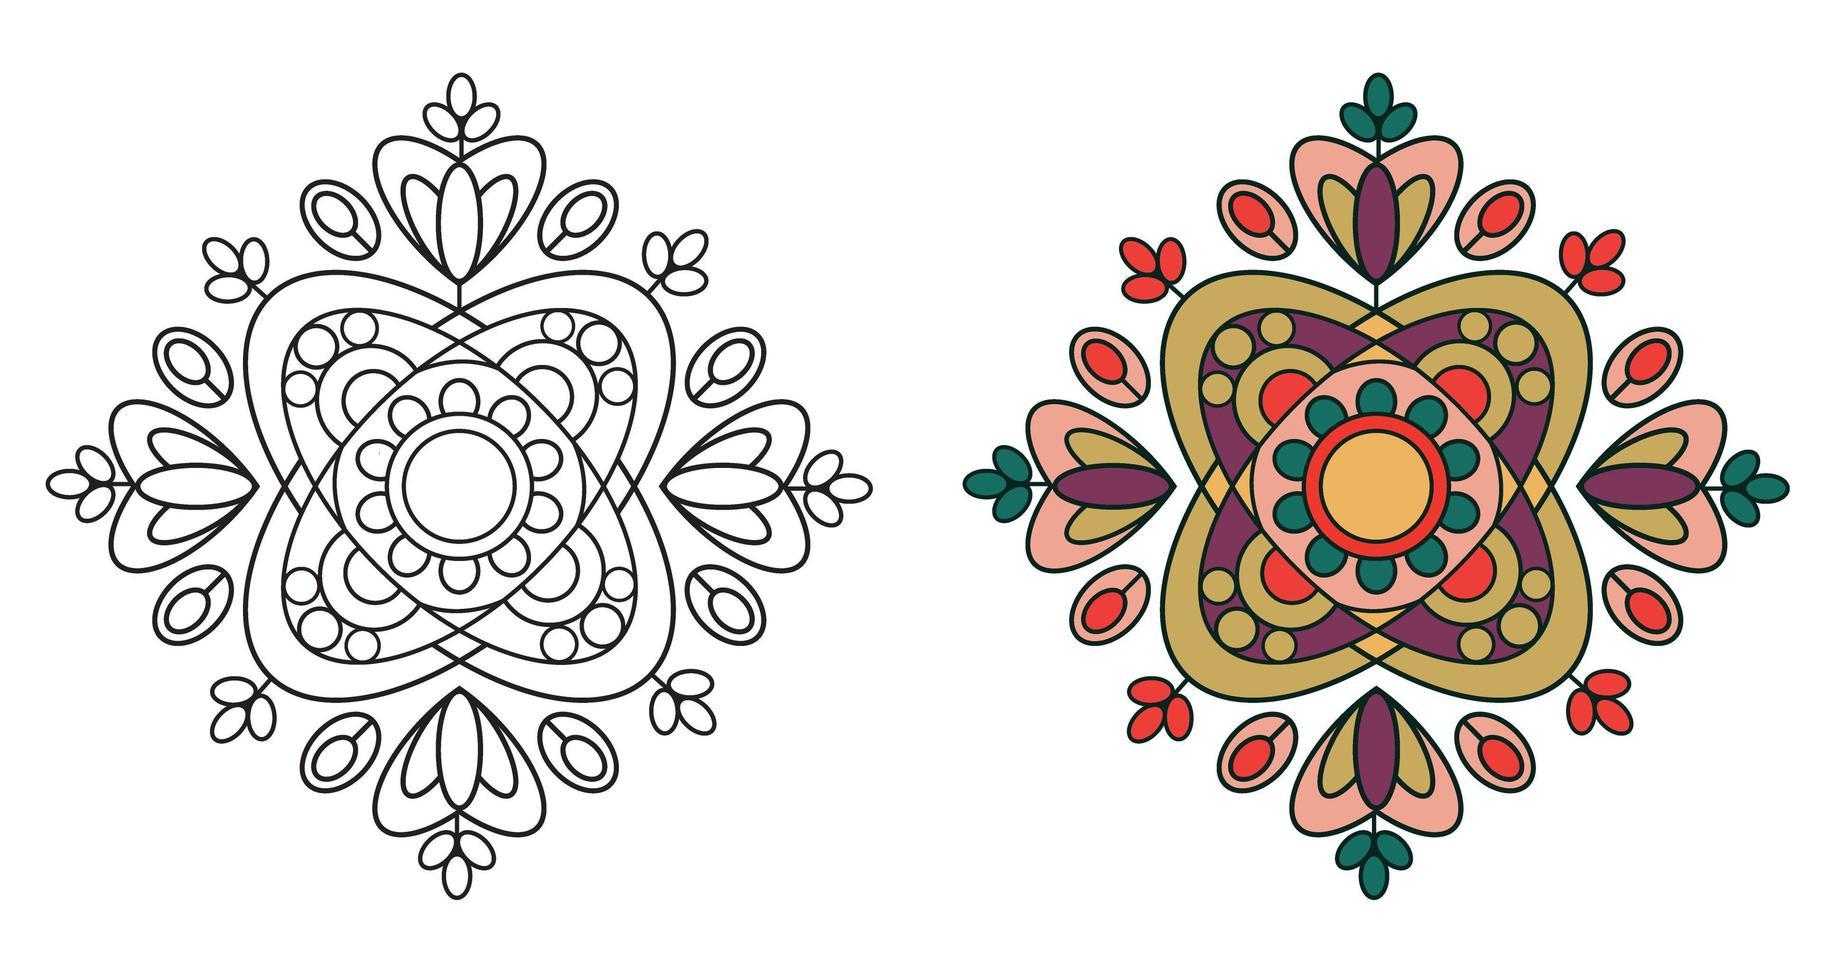 página de livro para colorir de mandala decorativa decorativa arredondada vetor